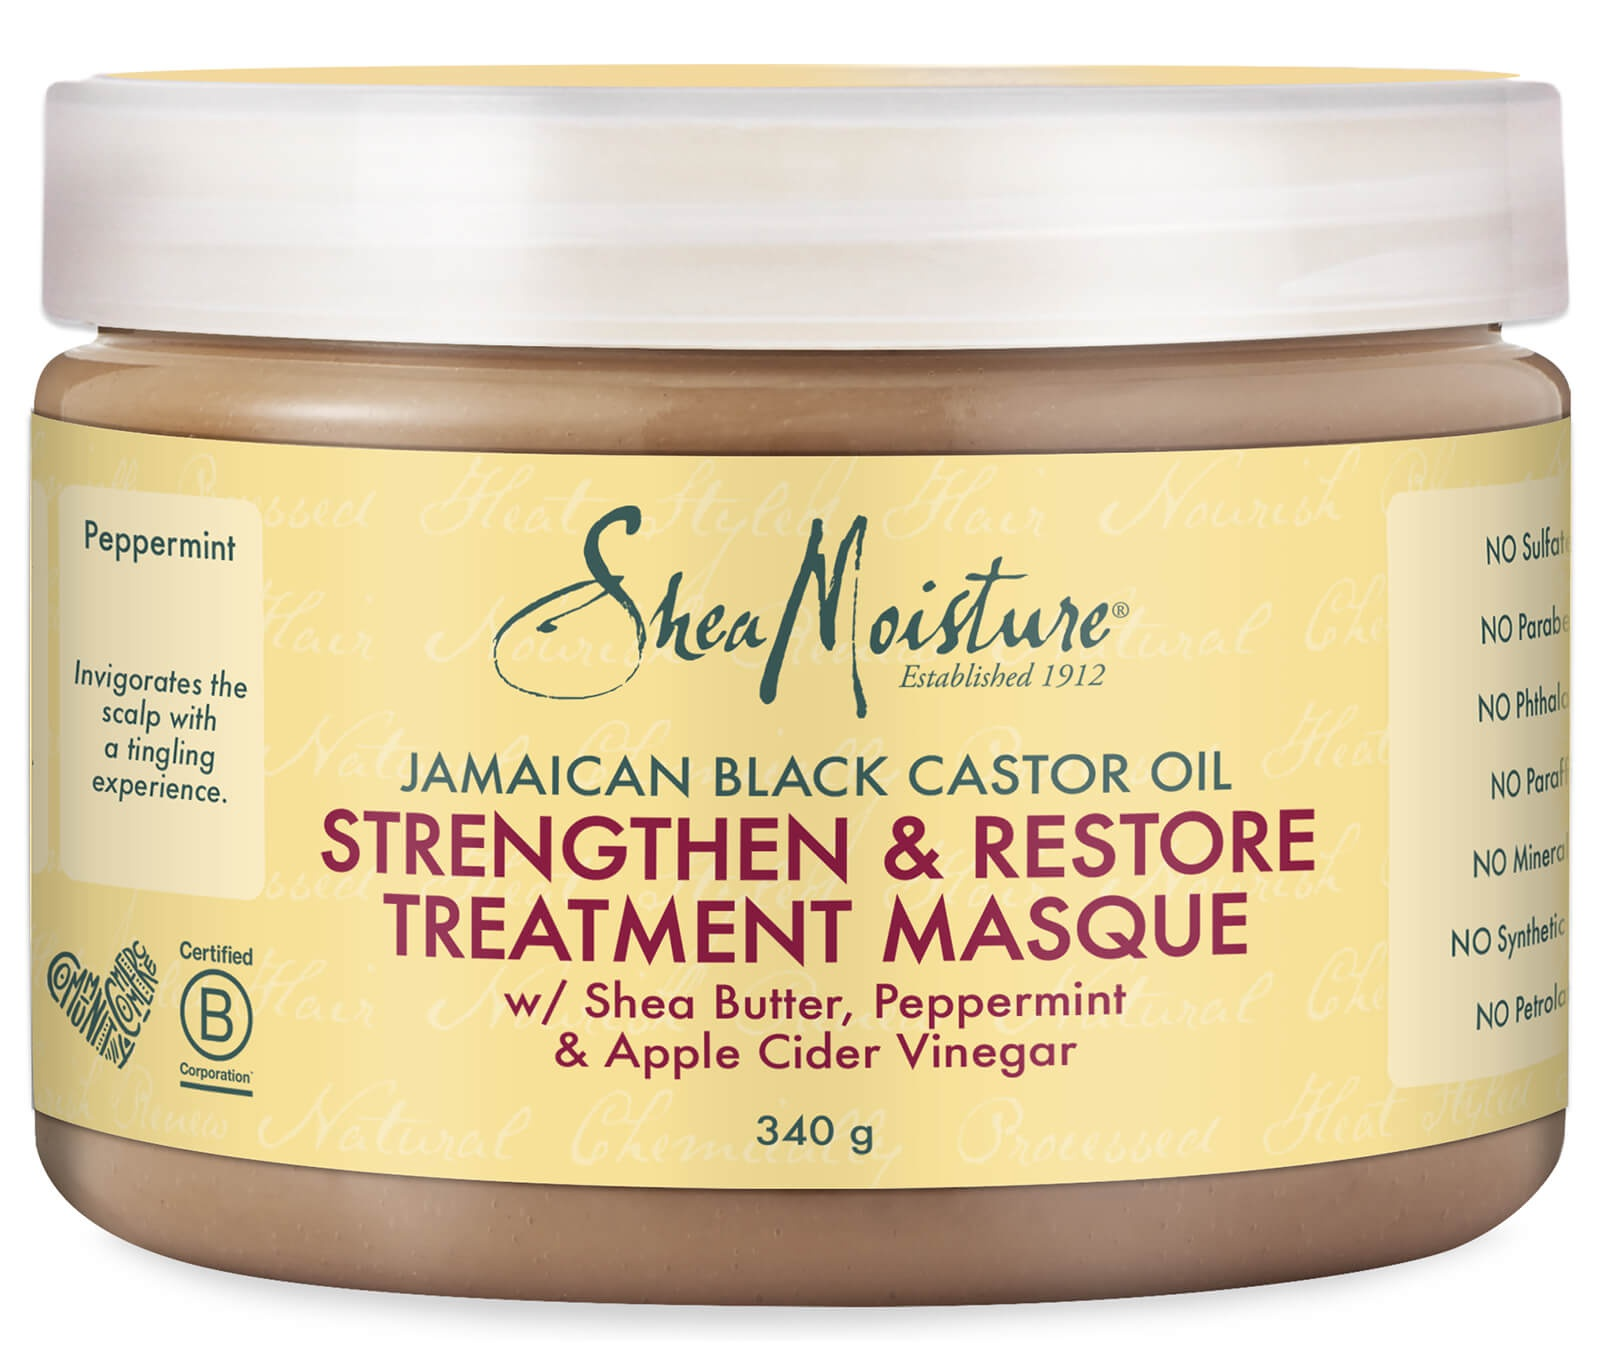 Shea Moisture Jamaican Black Castor Oil - Strengthen And Restore Treatment Masque